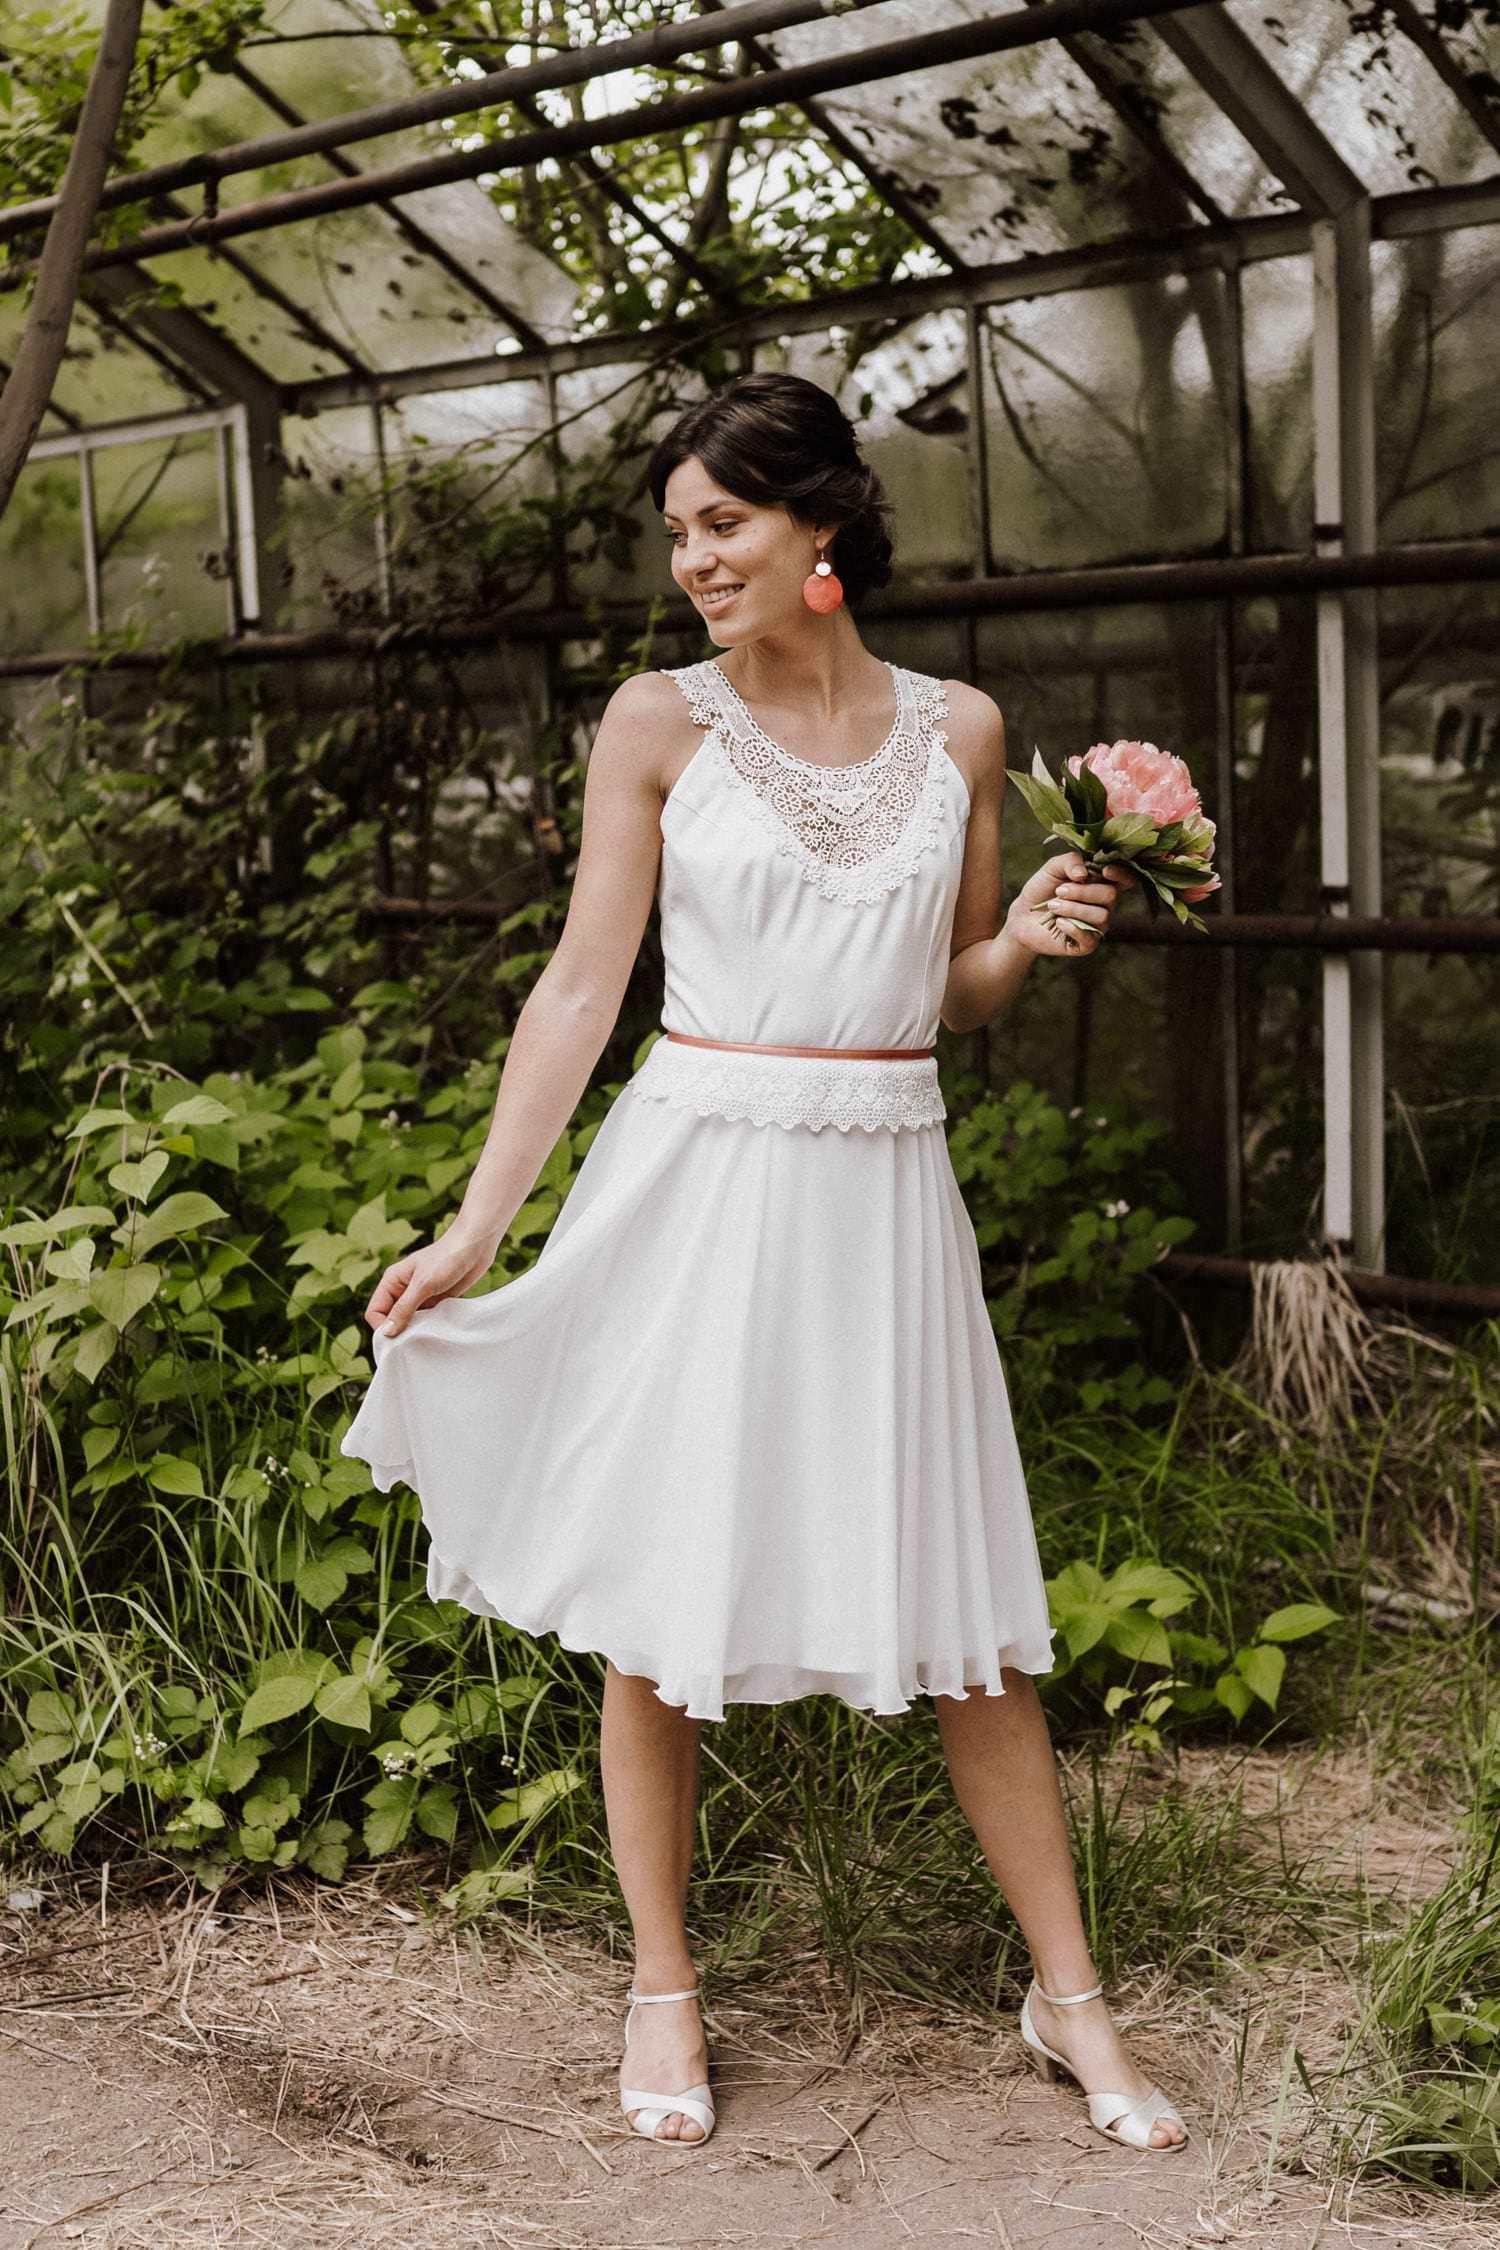 Lara - Boho Hochzeitskleid kurz mit Spitze - Claudia Heller